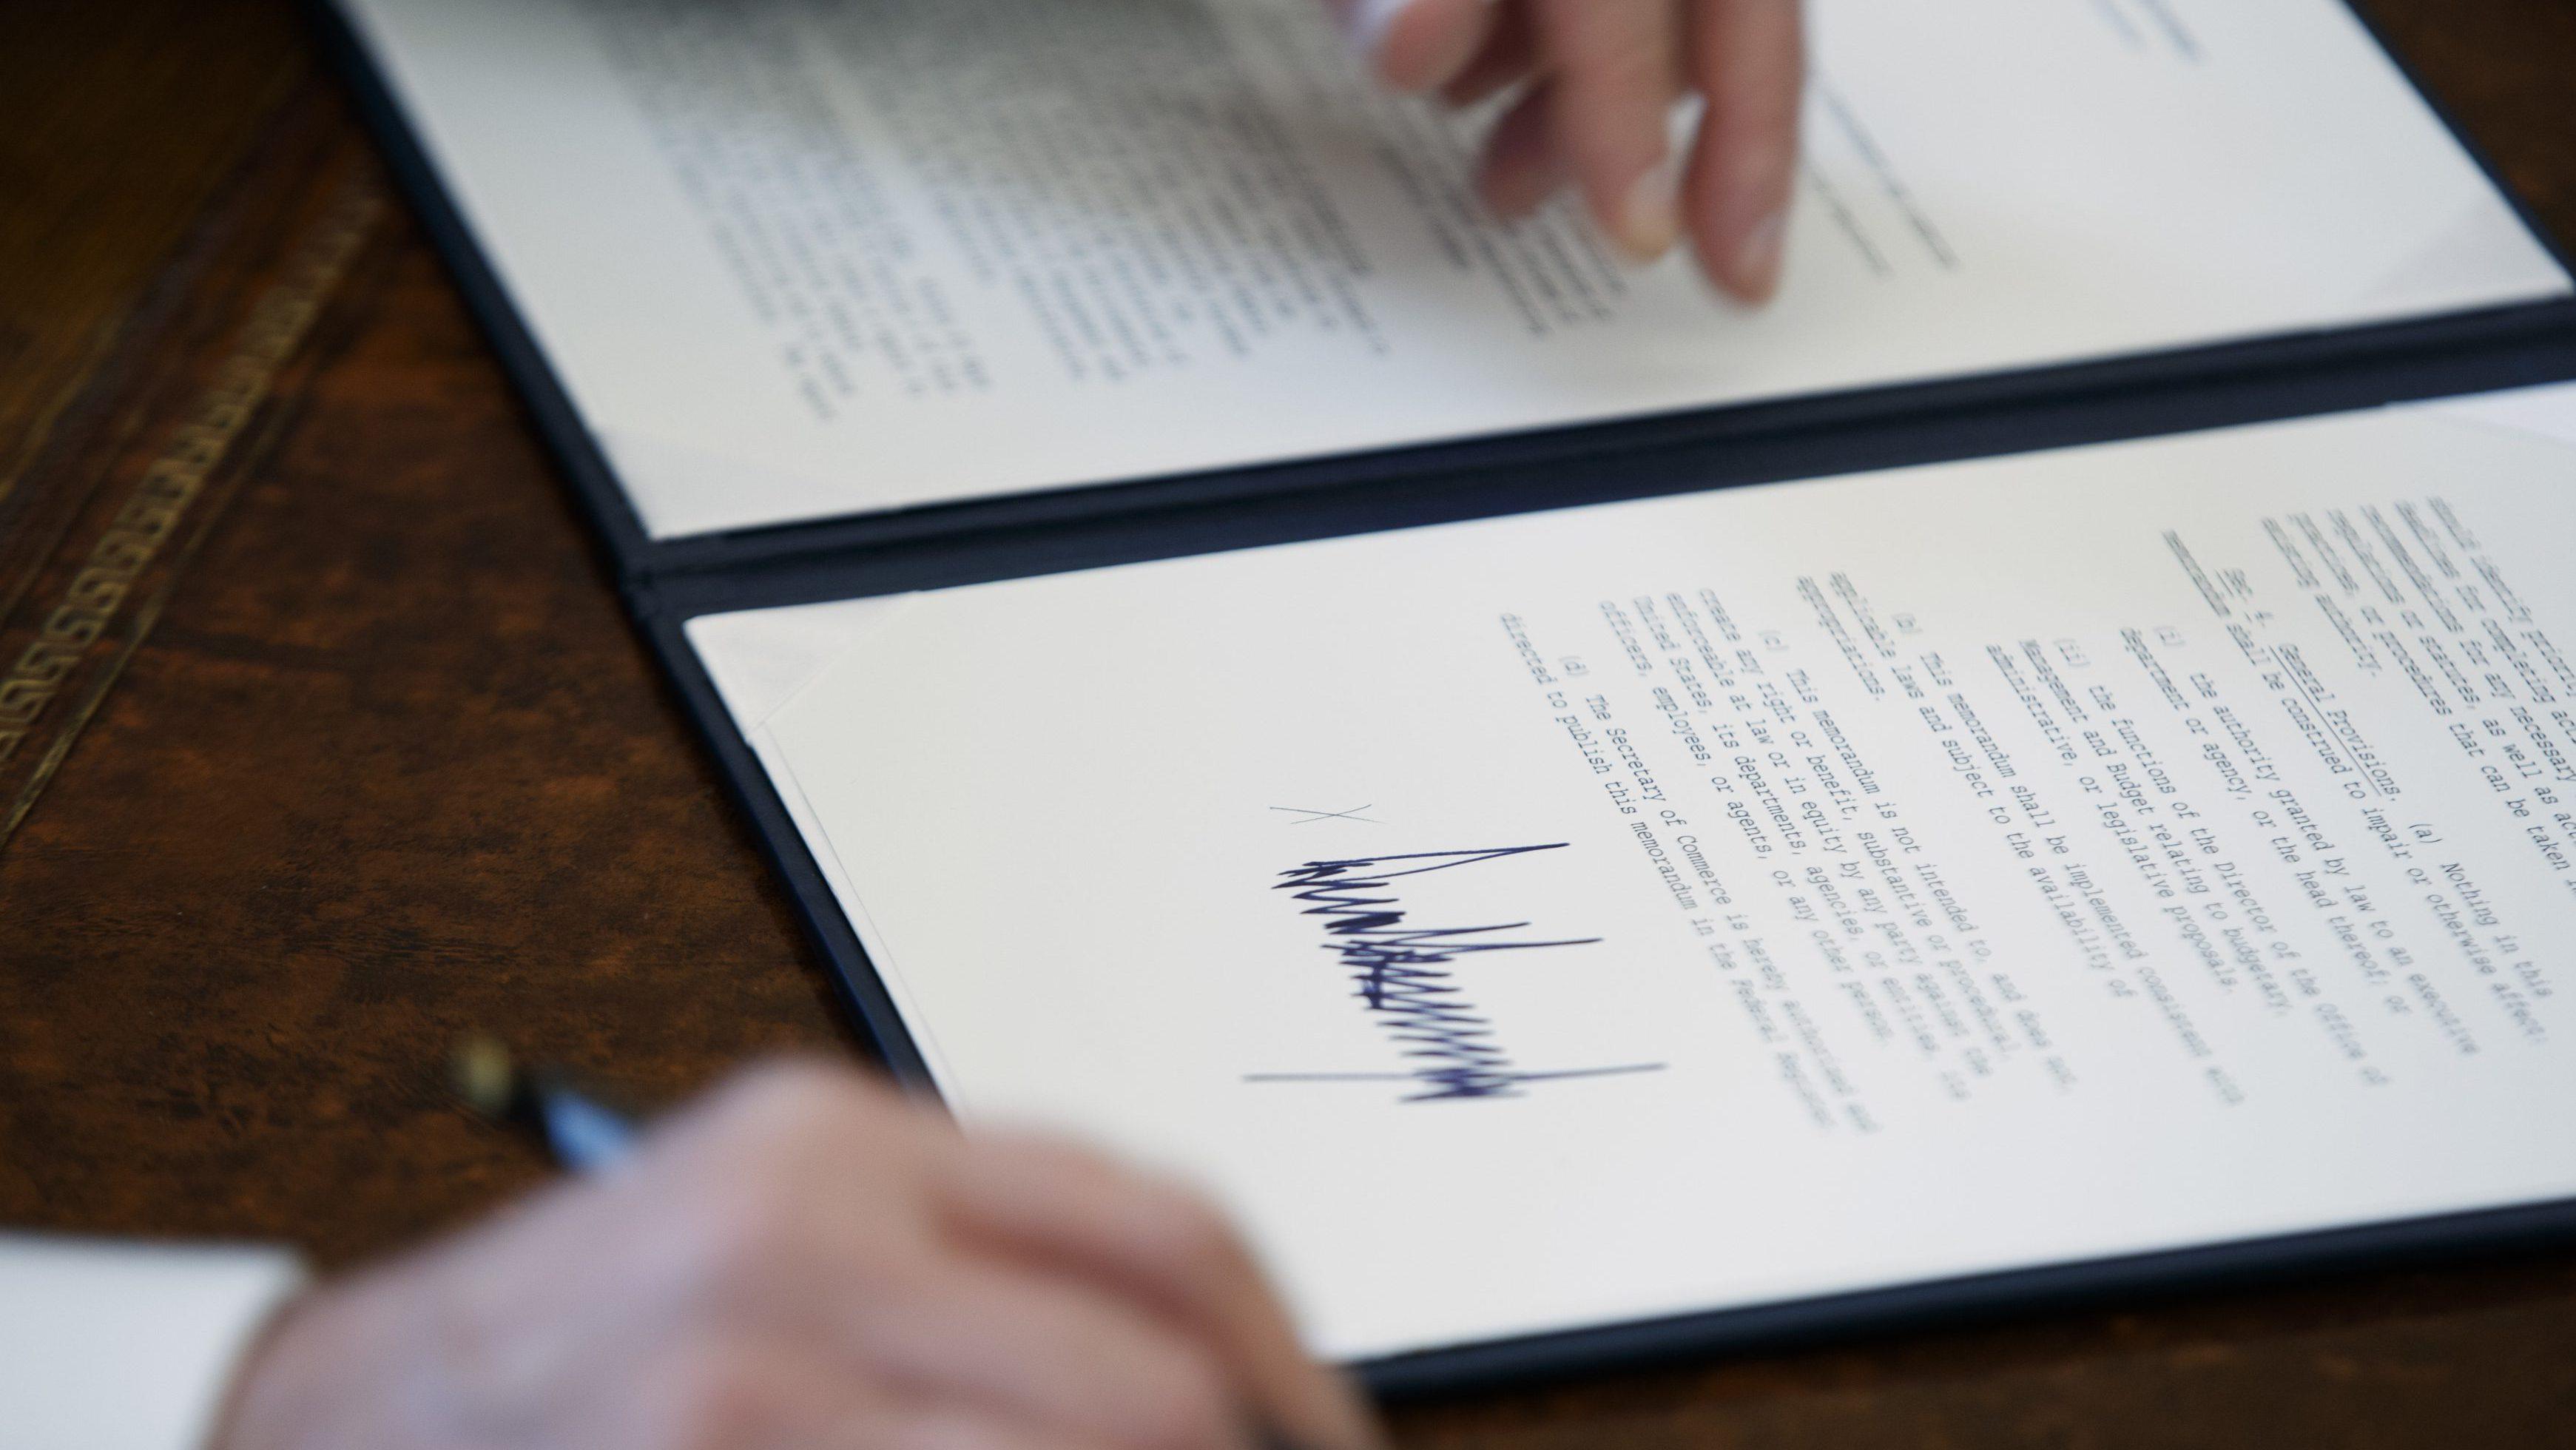 What are Donald Trump's executive orders so far? — Quartz